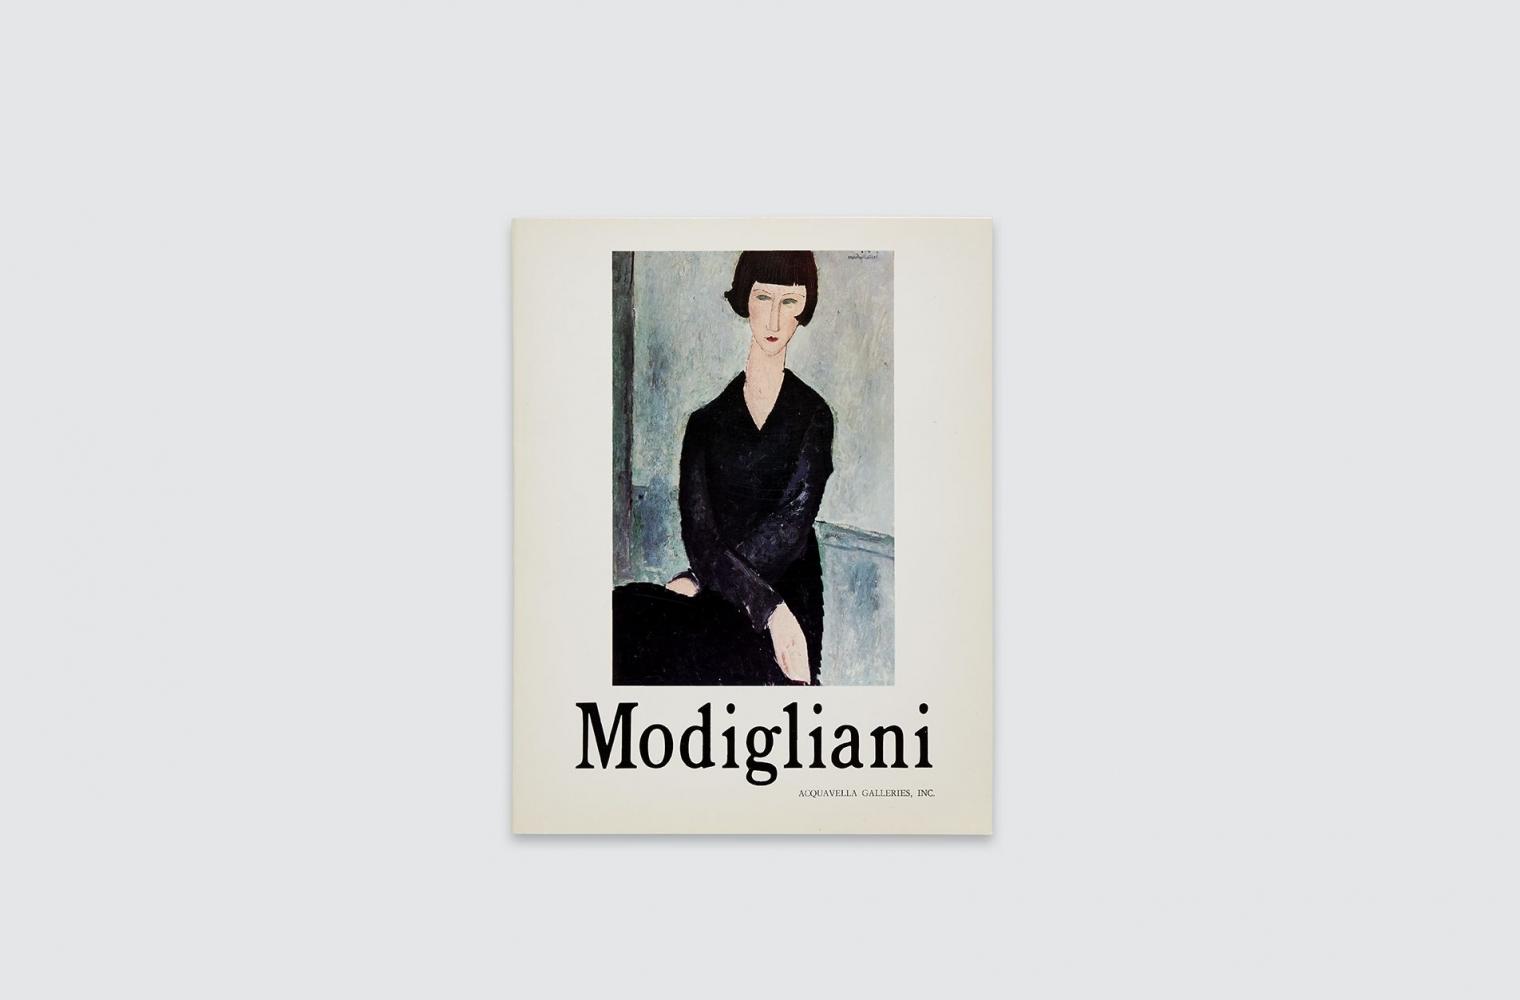 Catalogue for Amedeo Modigliani exhibition, fall 1971.